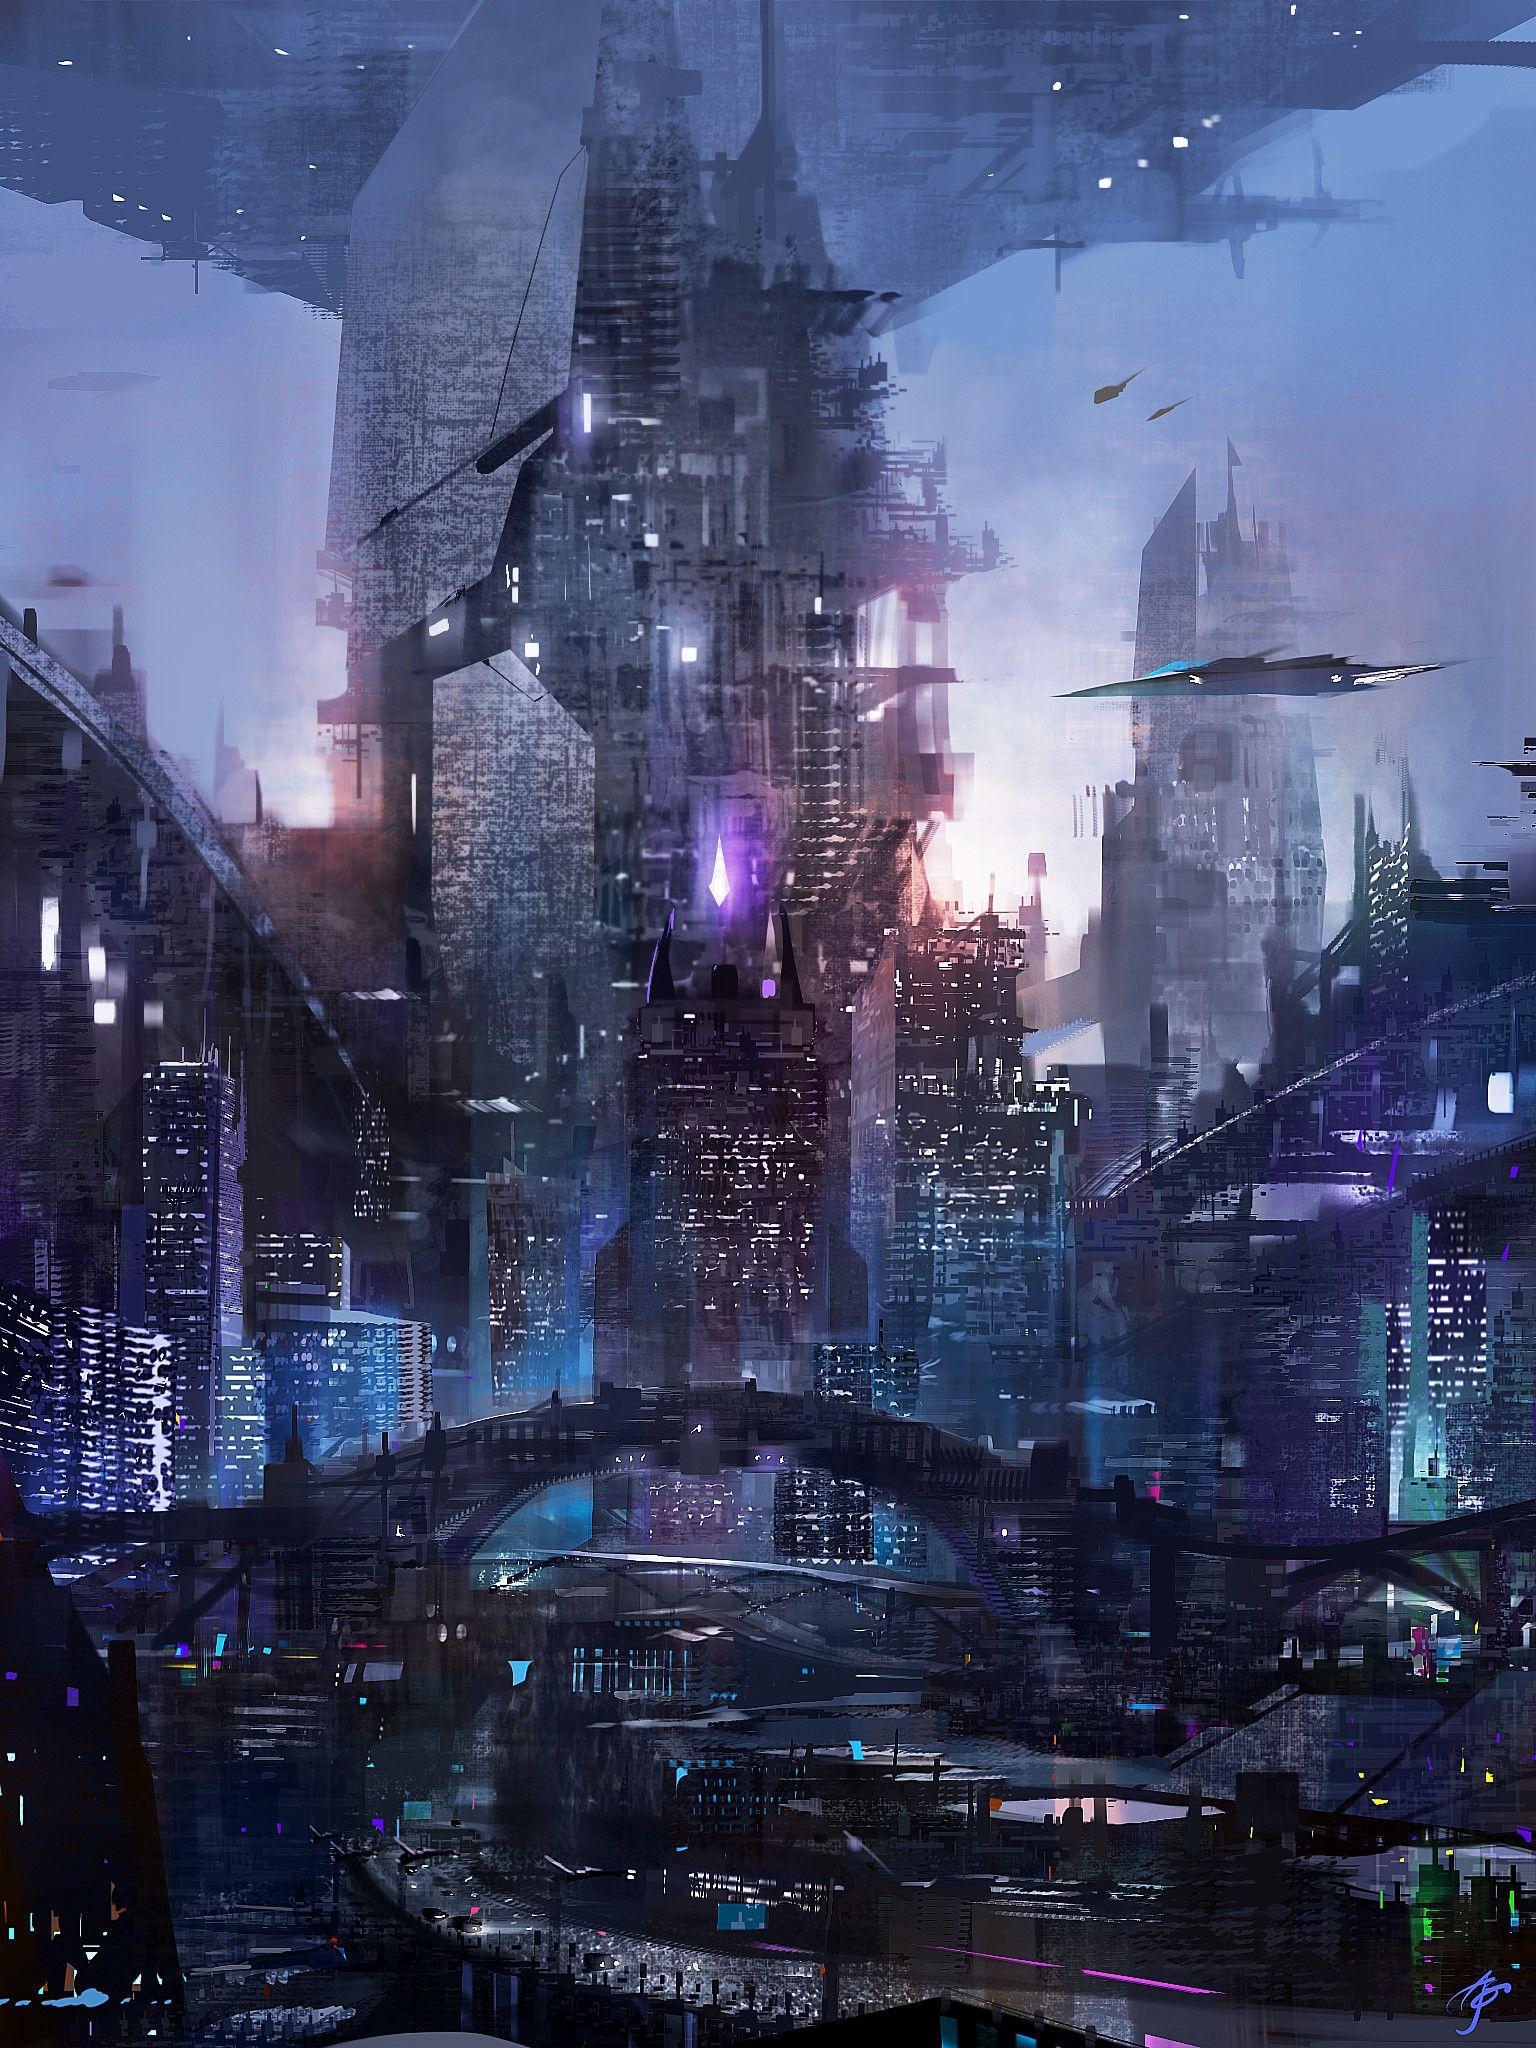 Headquarters, Allen Song | Futuristic city, Cyberpunk city